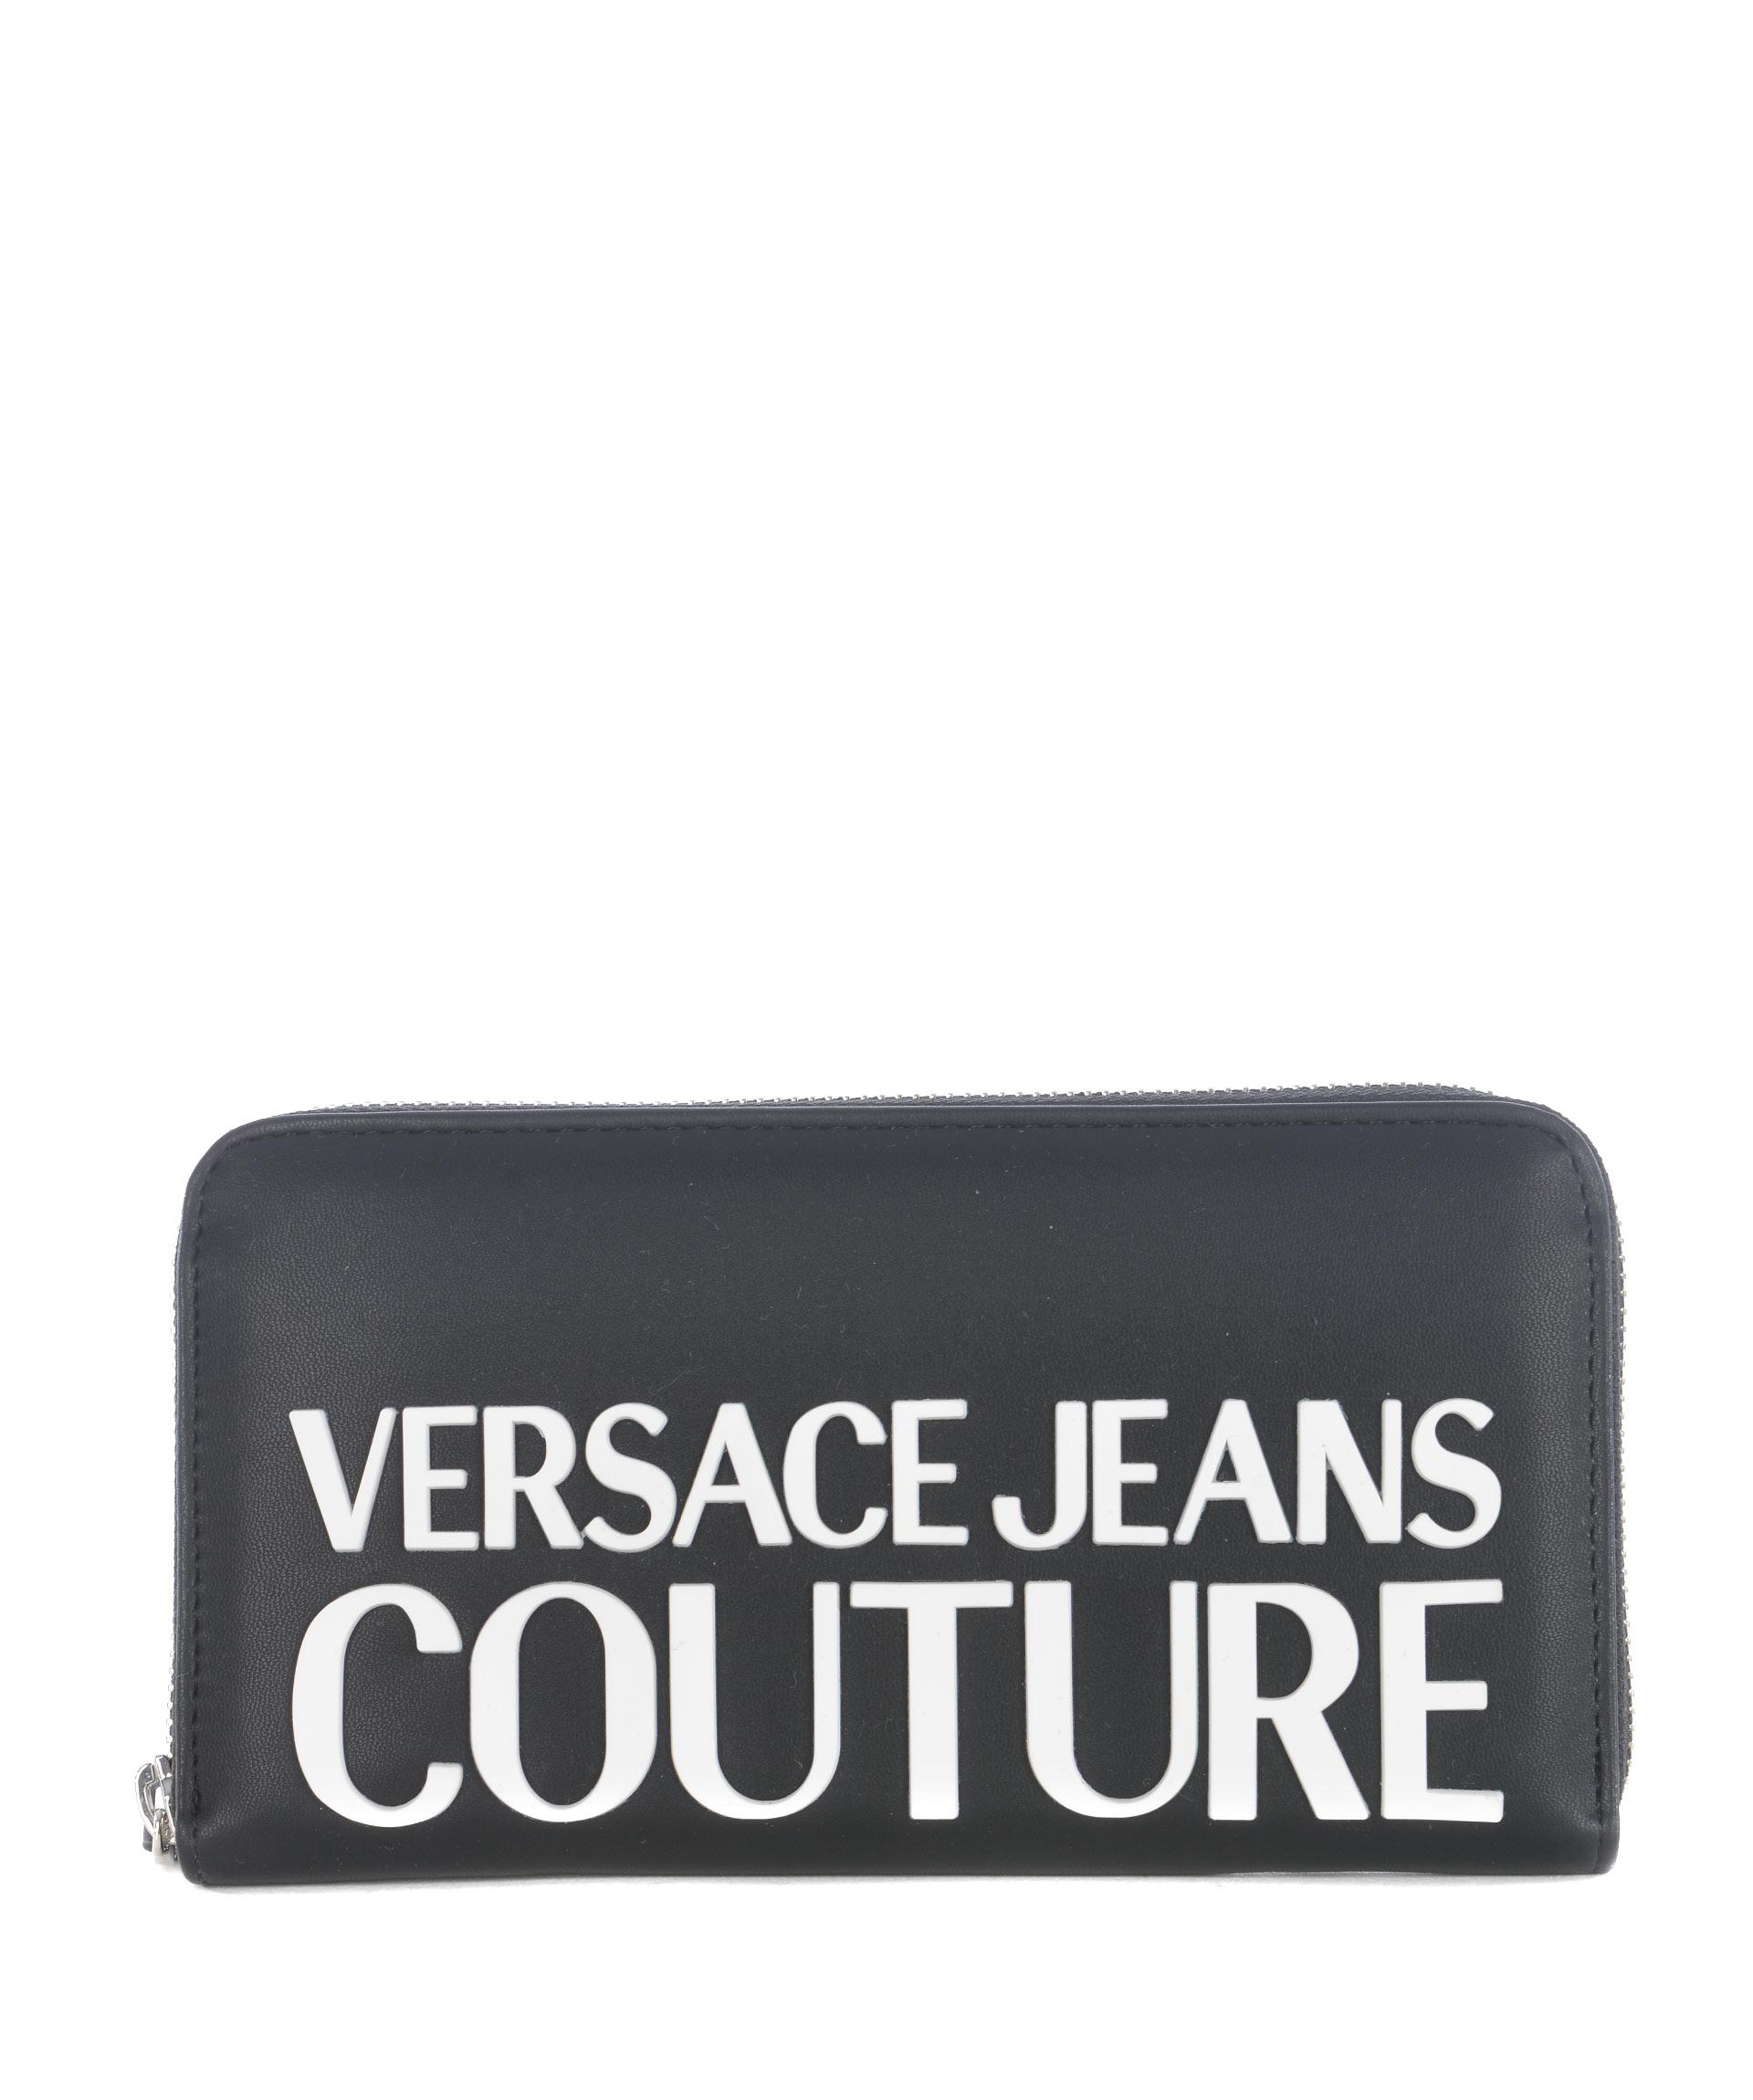 Portafoglio Versace Jeans